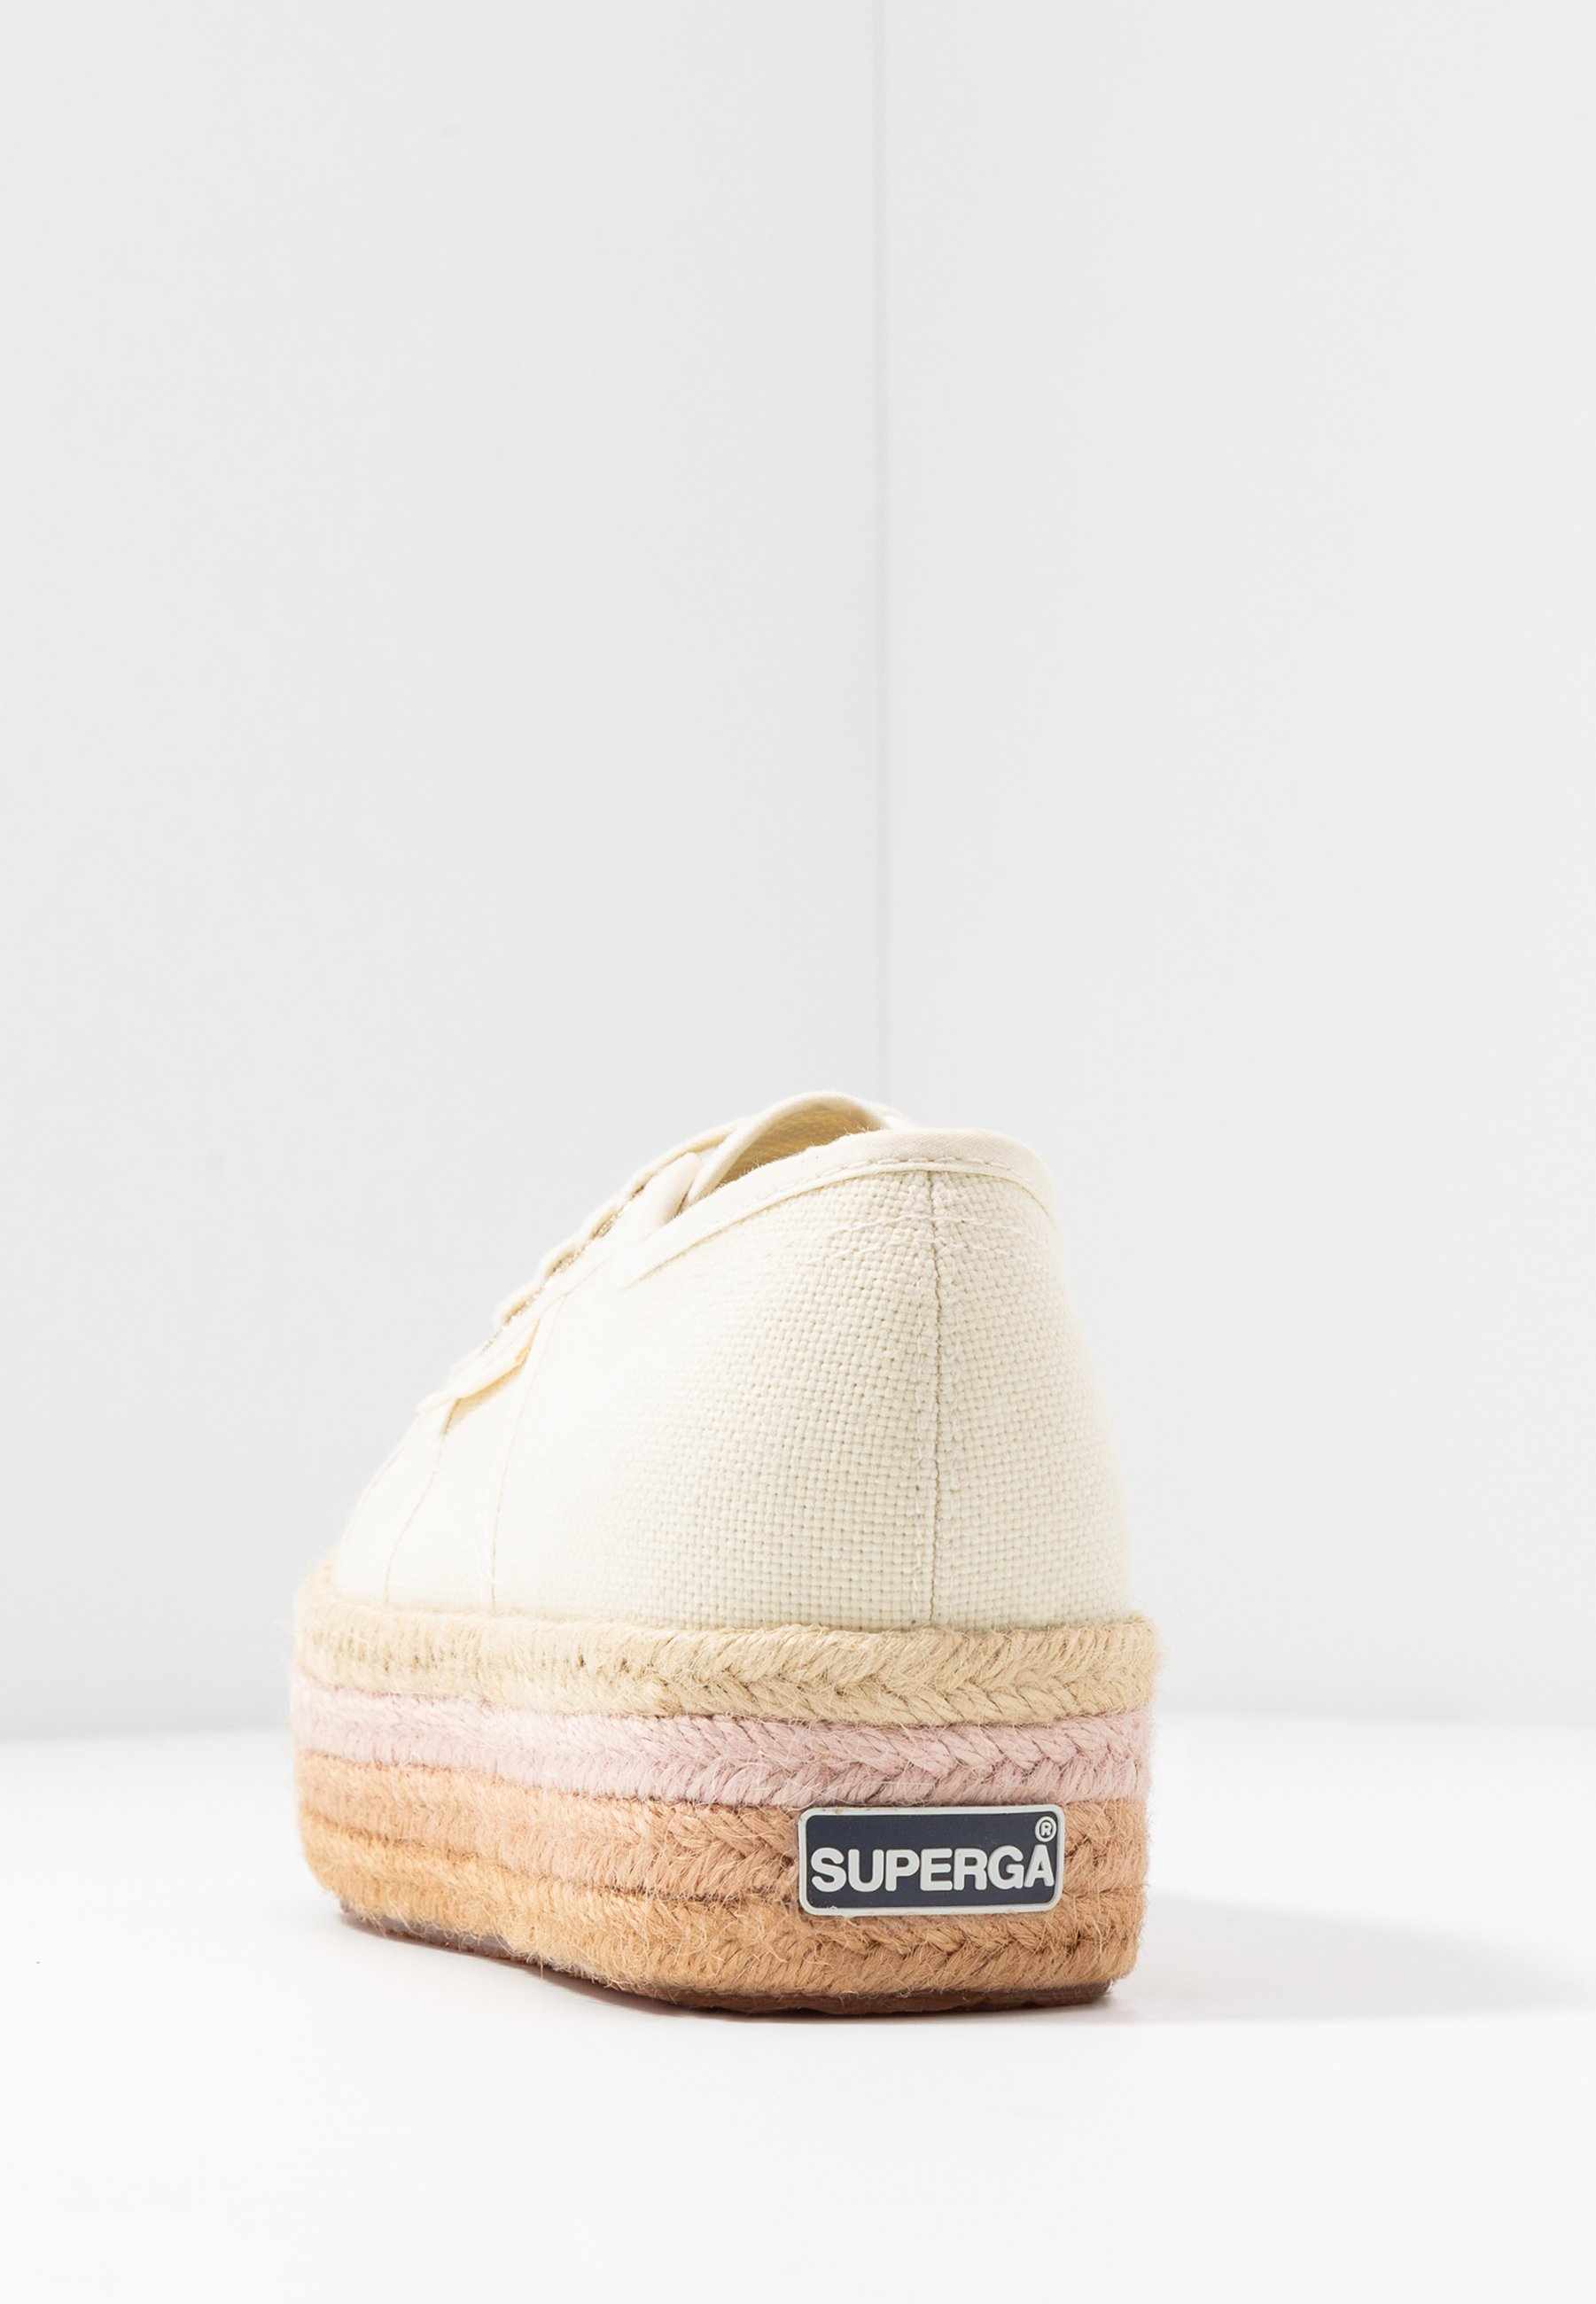 Superga 2790 - Espadrilles - beige/light sand